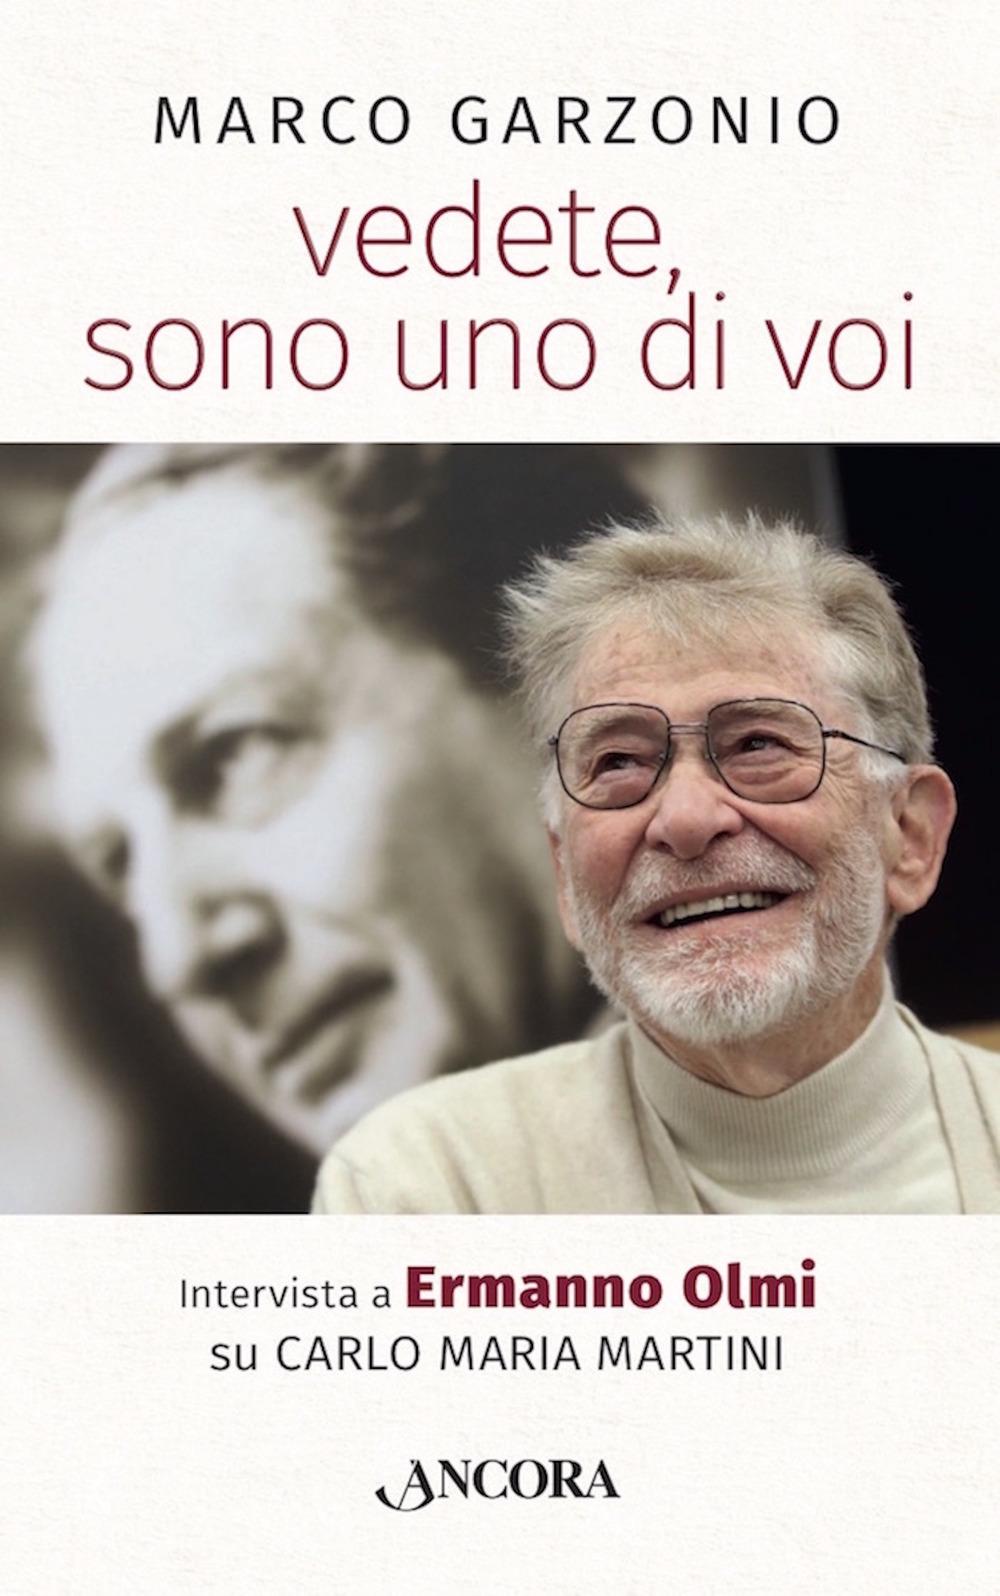 Marco Garzonio